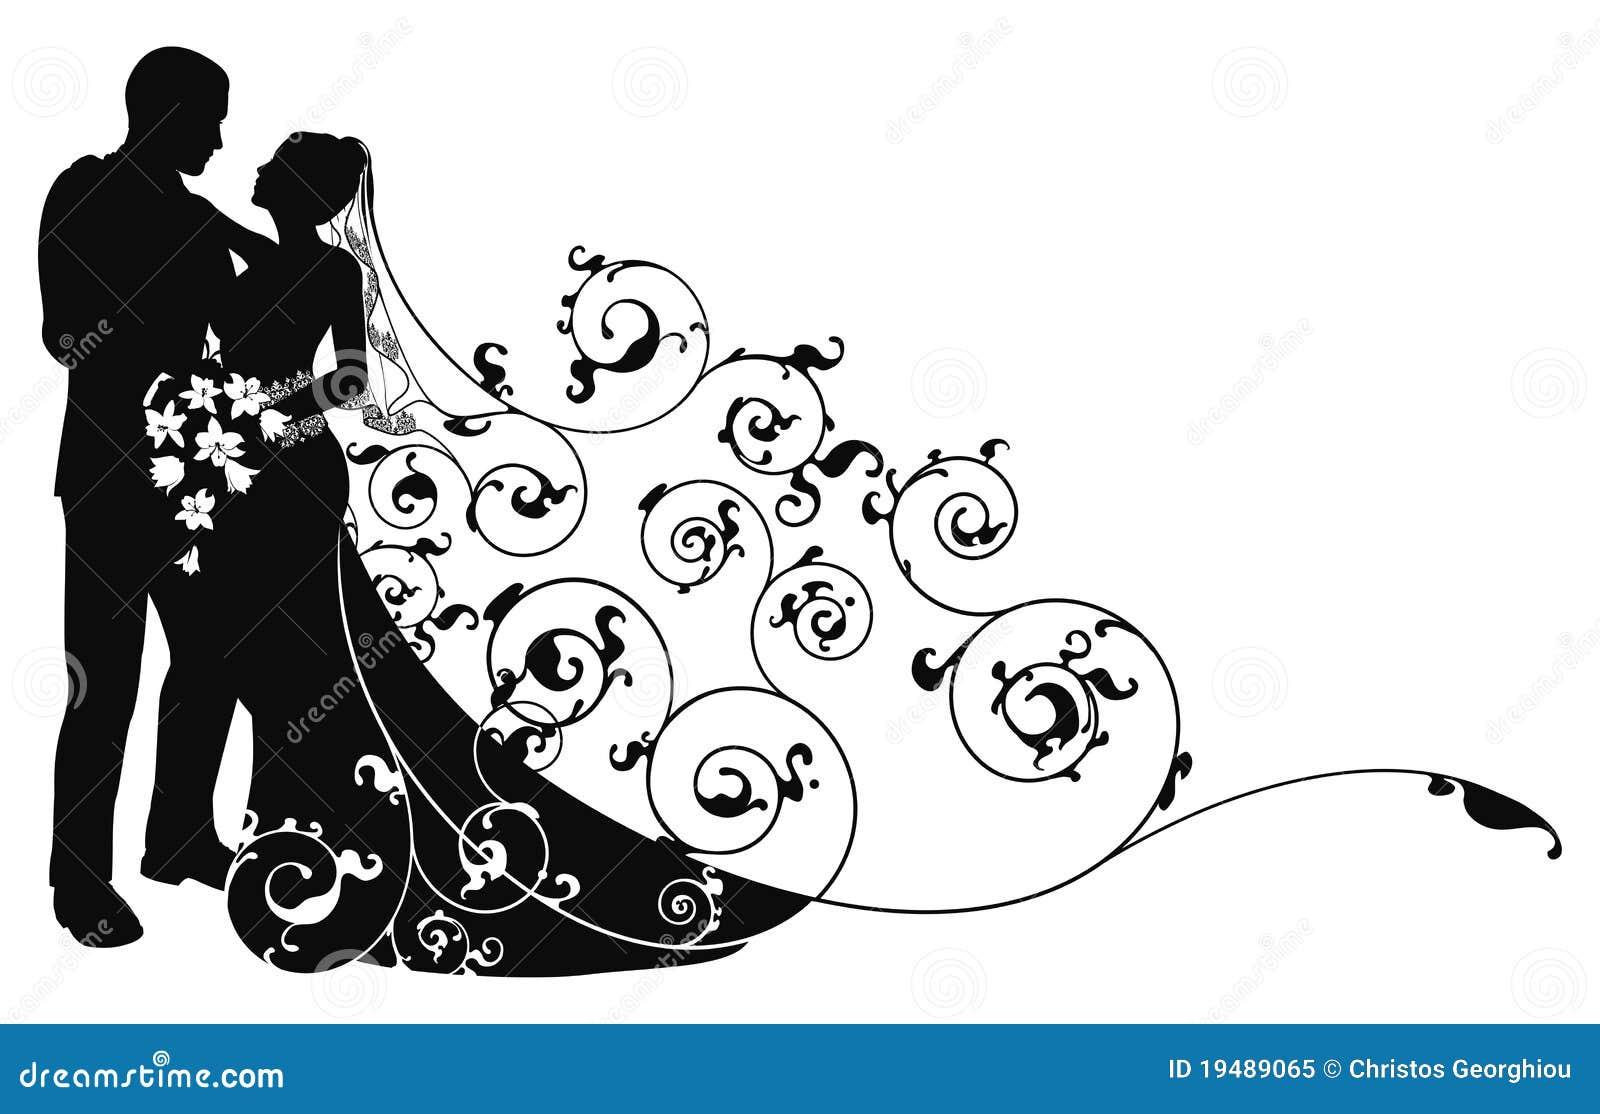 Bride Groom Silhouette Stock Illustrations 4 970 Bride Groom Silhouette Stock Illustrations Vectors Clipart Dreamstime